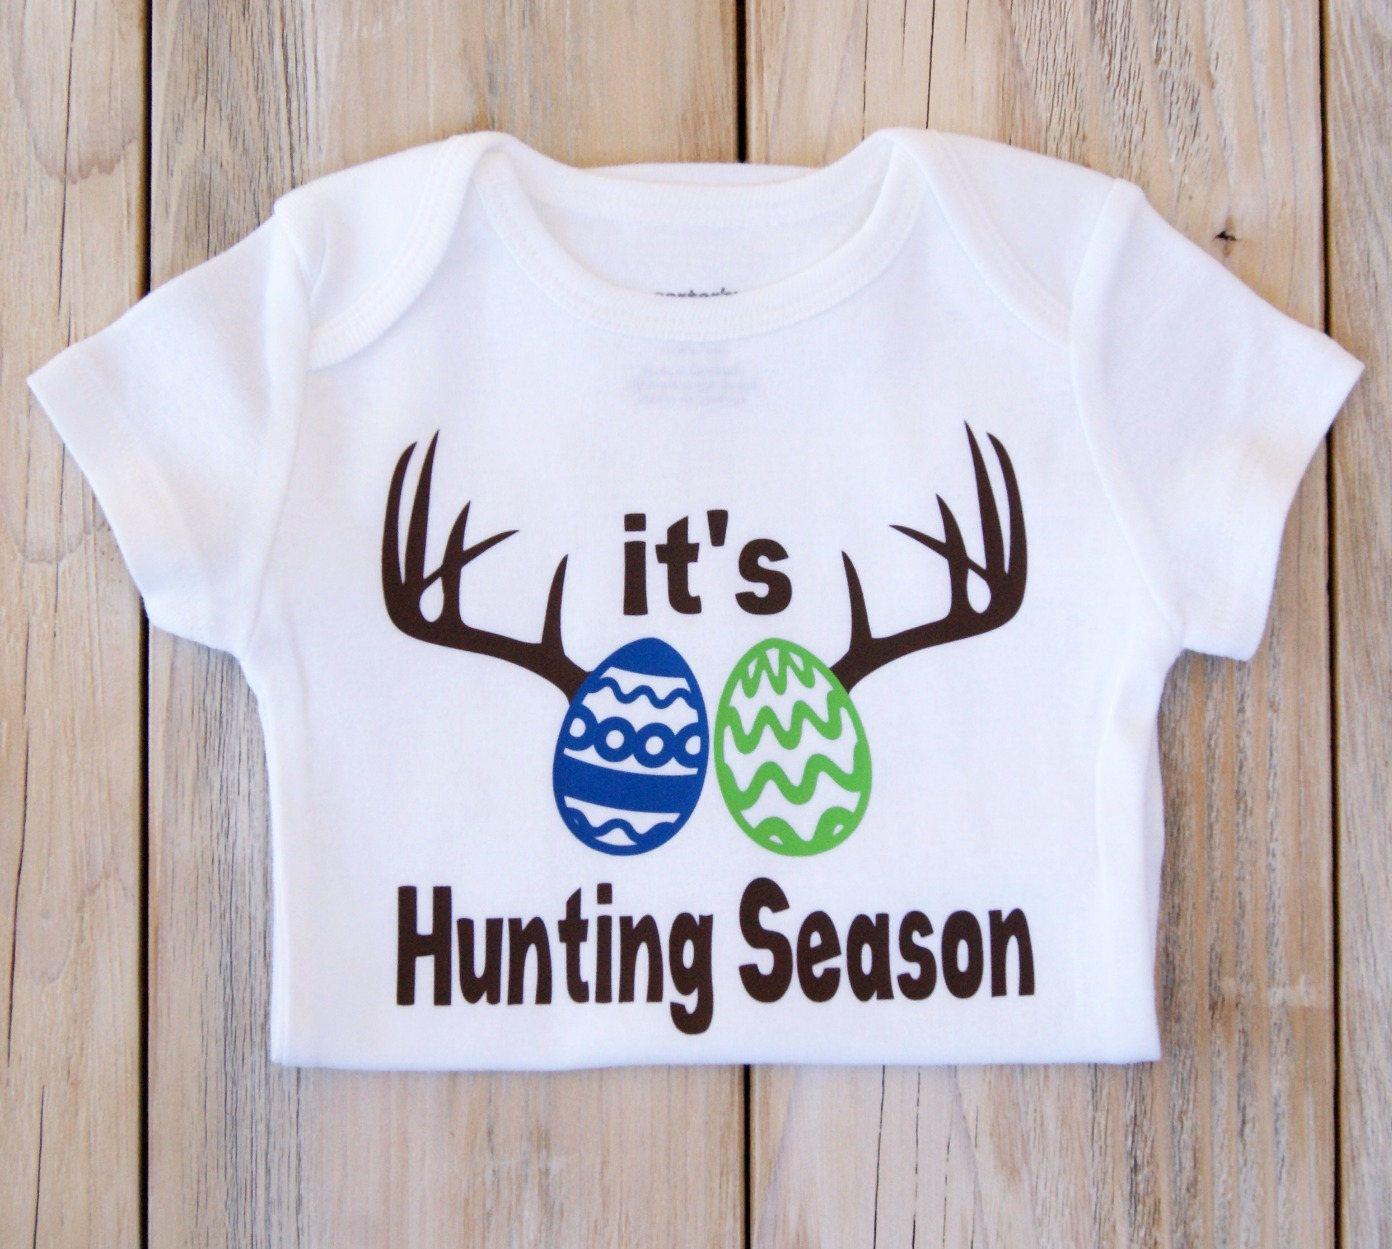 41335e844 It's Hunting Season-Easter-Easter Eggs-Eggs Hunting-Baby Girl or Boy Onesie-Baby-Baby  Clothes-Custom Onesie-Funny baby Onesie-Holiday by MyFayevoriteThings ...